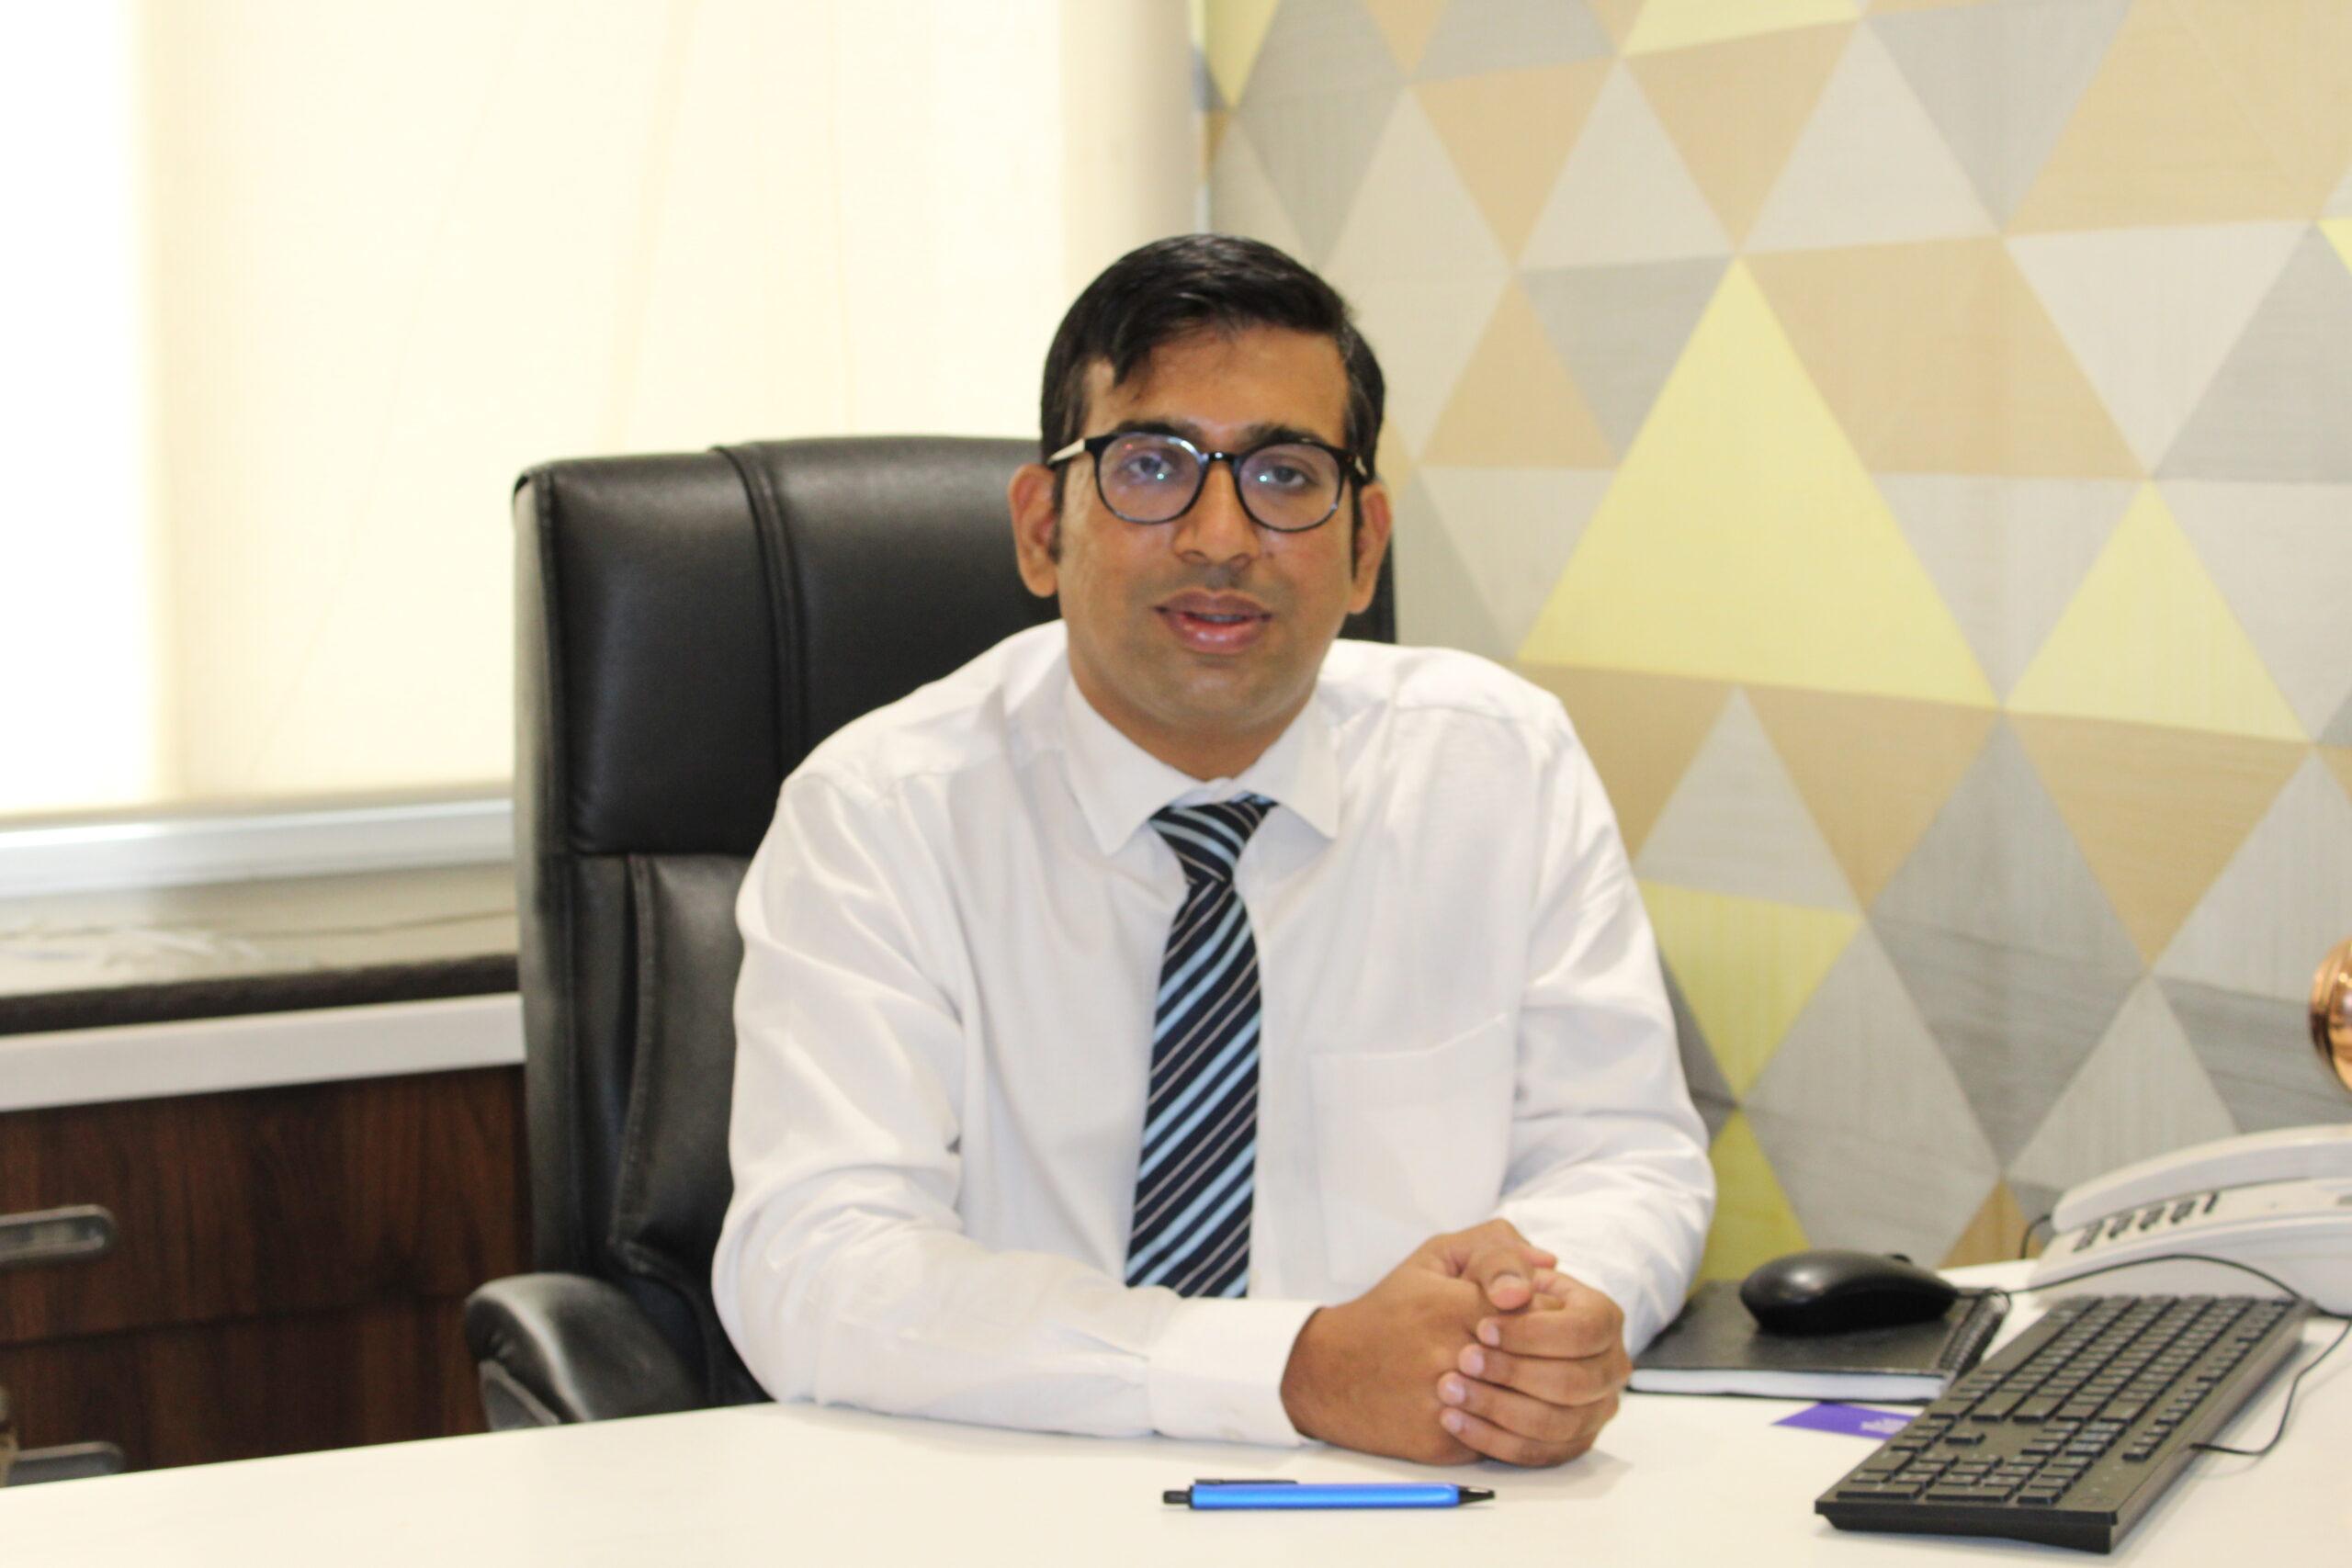 Best Urologist in Pune - Dr. Irfan Shaikh